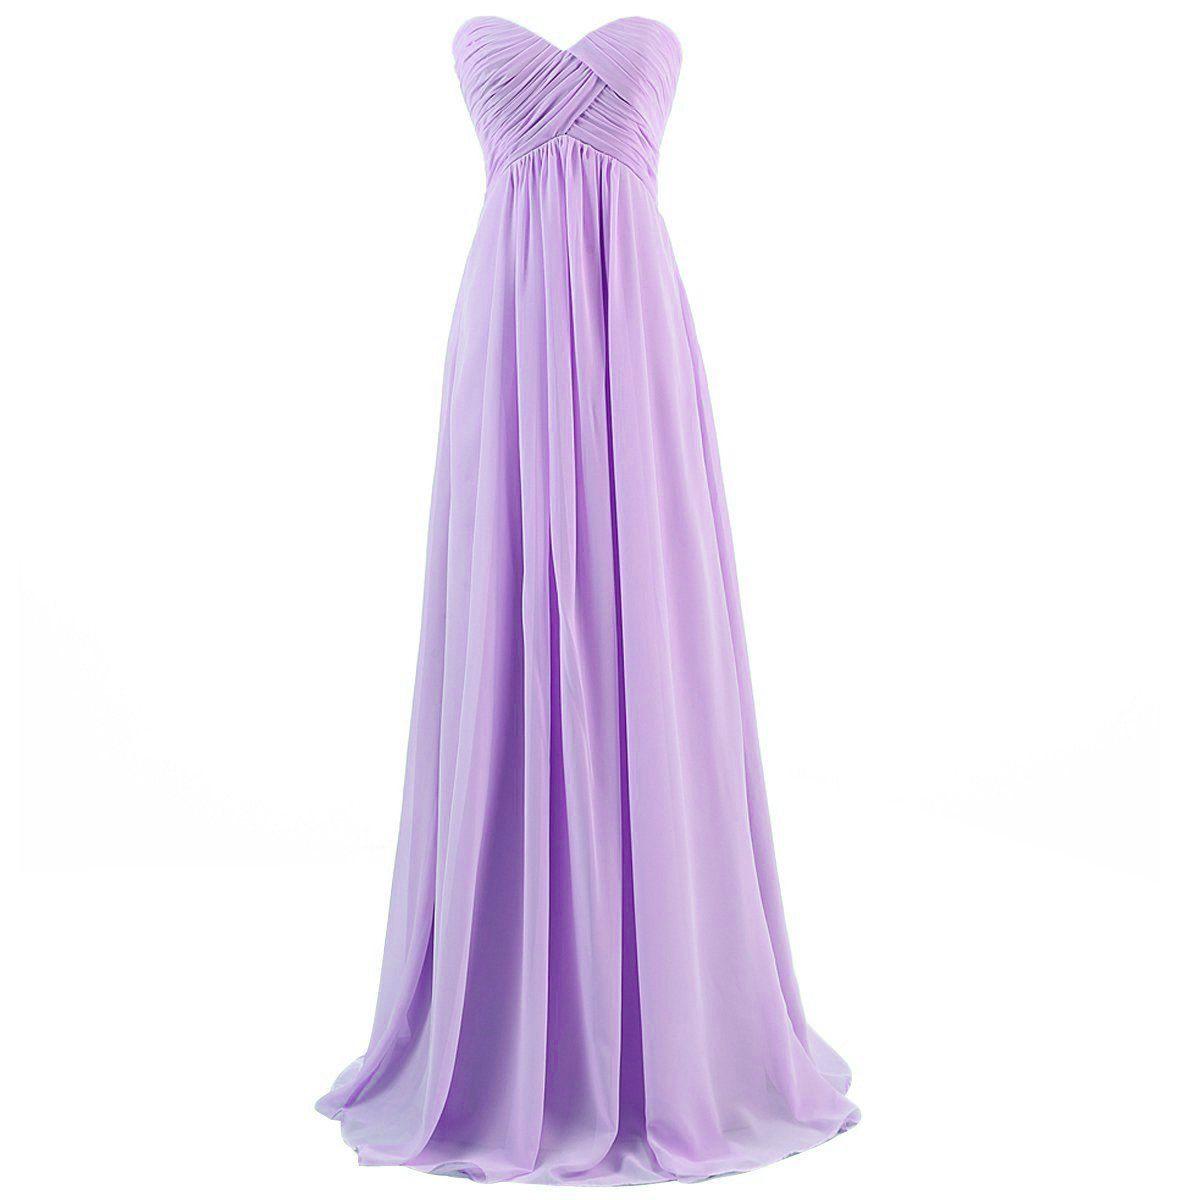 15 Großartig Chiffon Abendkleider Stylish Erstaunlich Chiffon Abendkleider Boutique